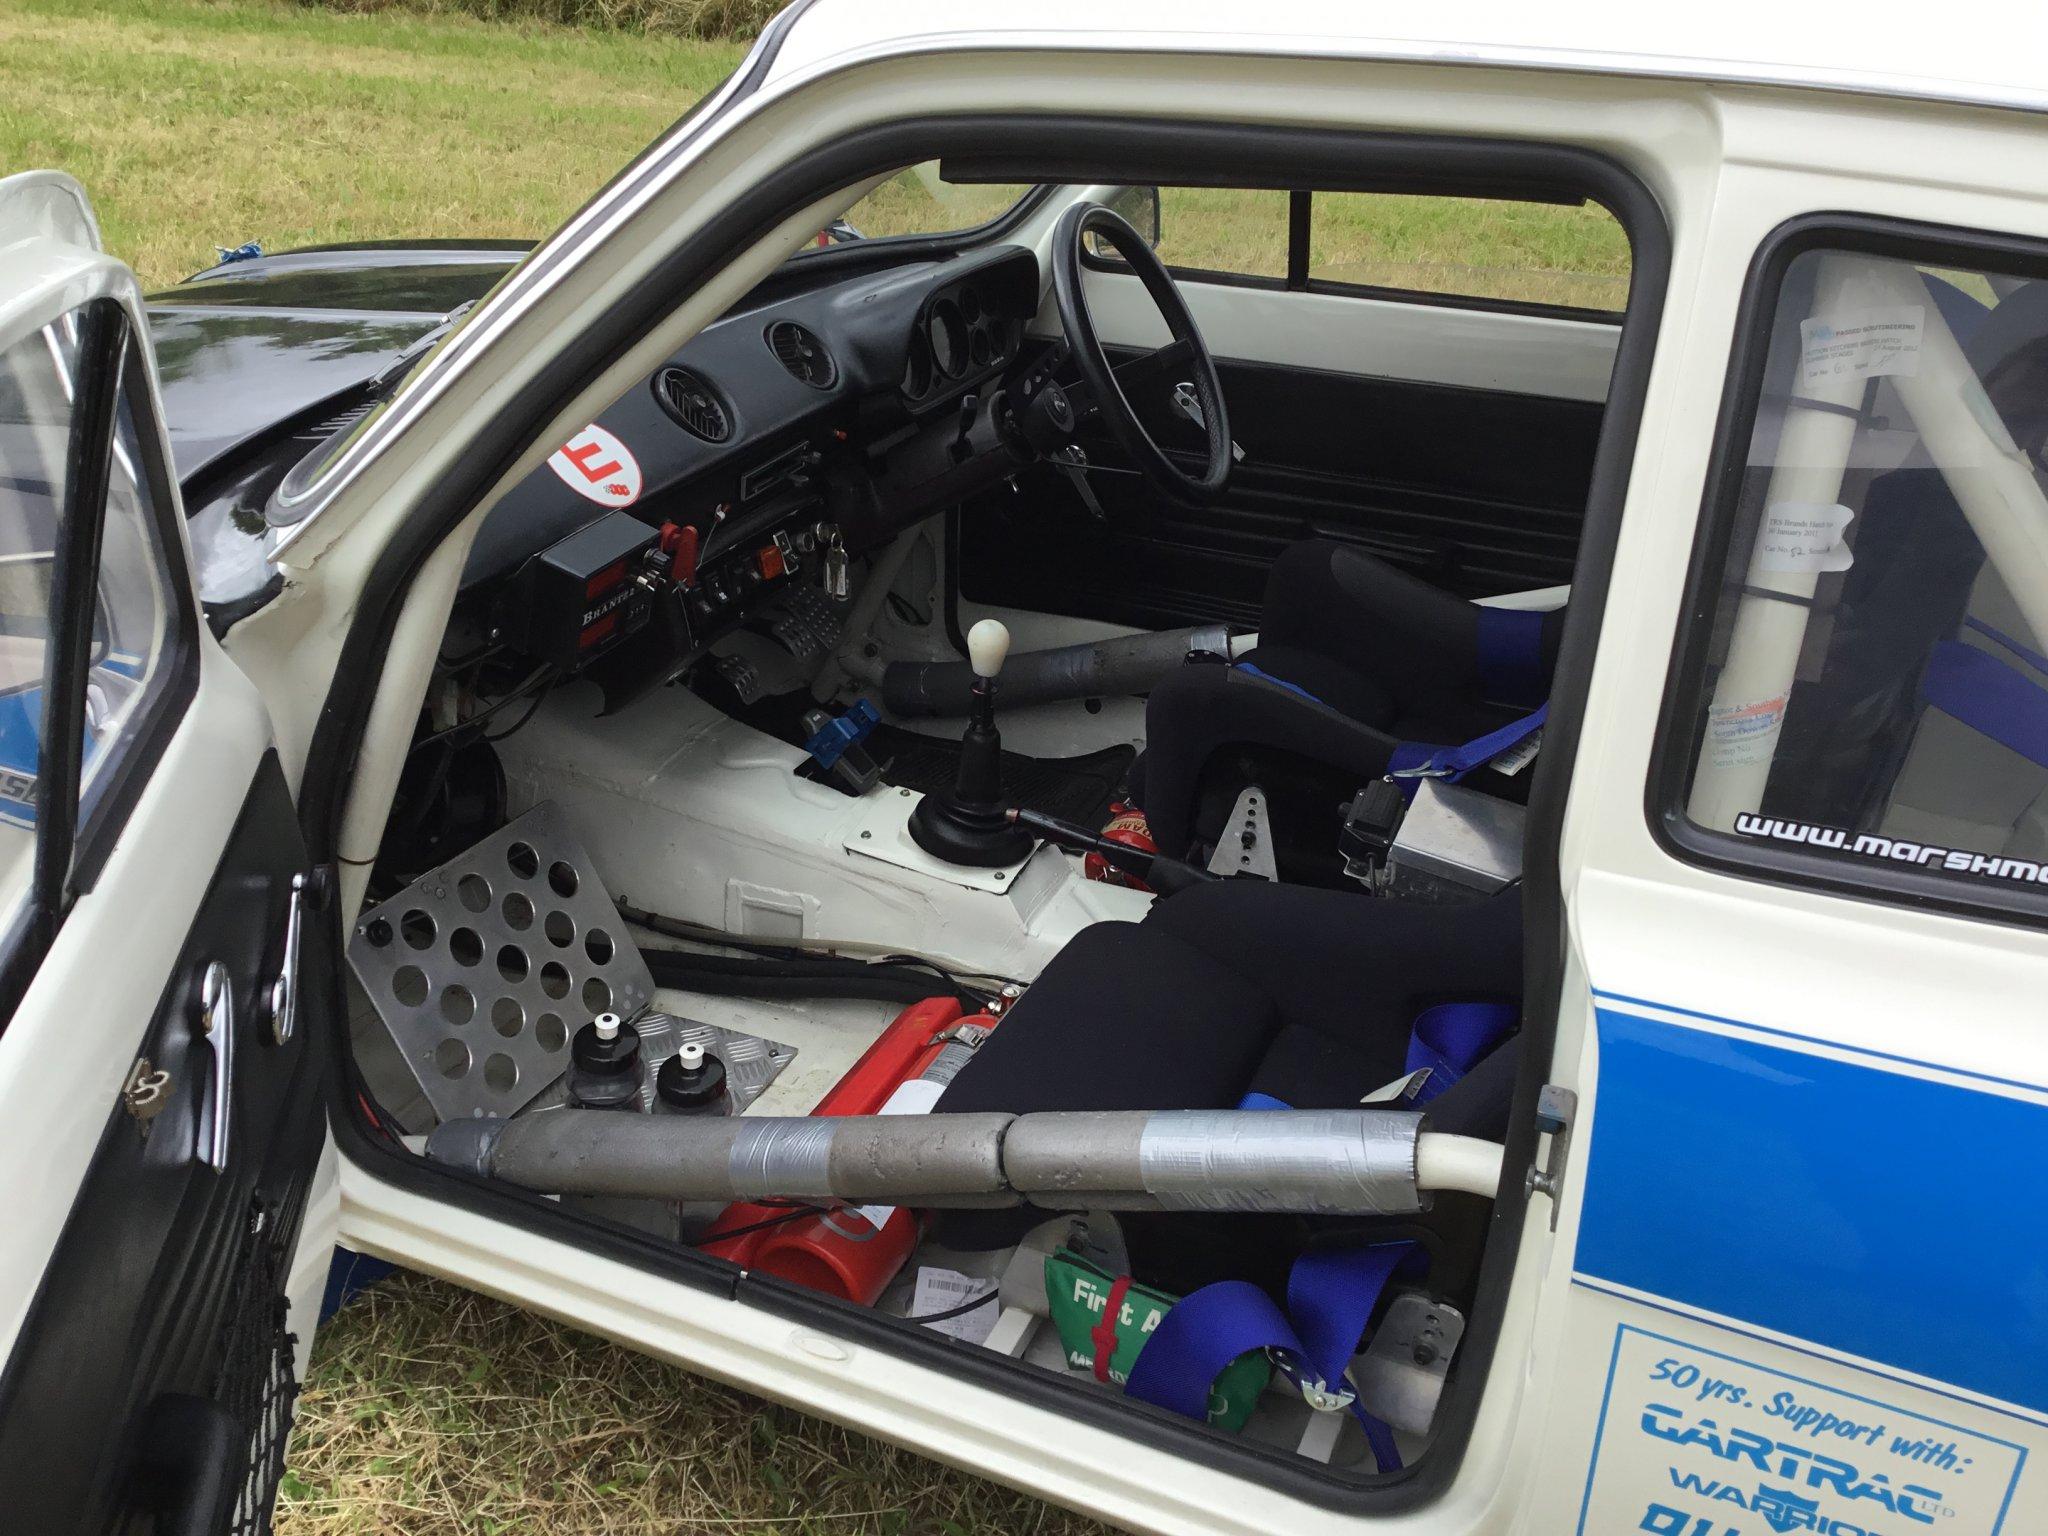 ford escort mk1 historic rally car historic motorsport. Black Bedroom Furniture Sets. Home Design Ideas